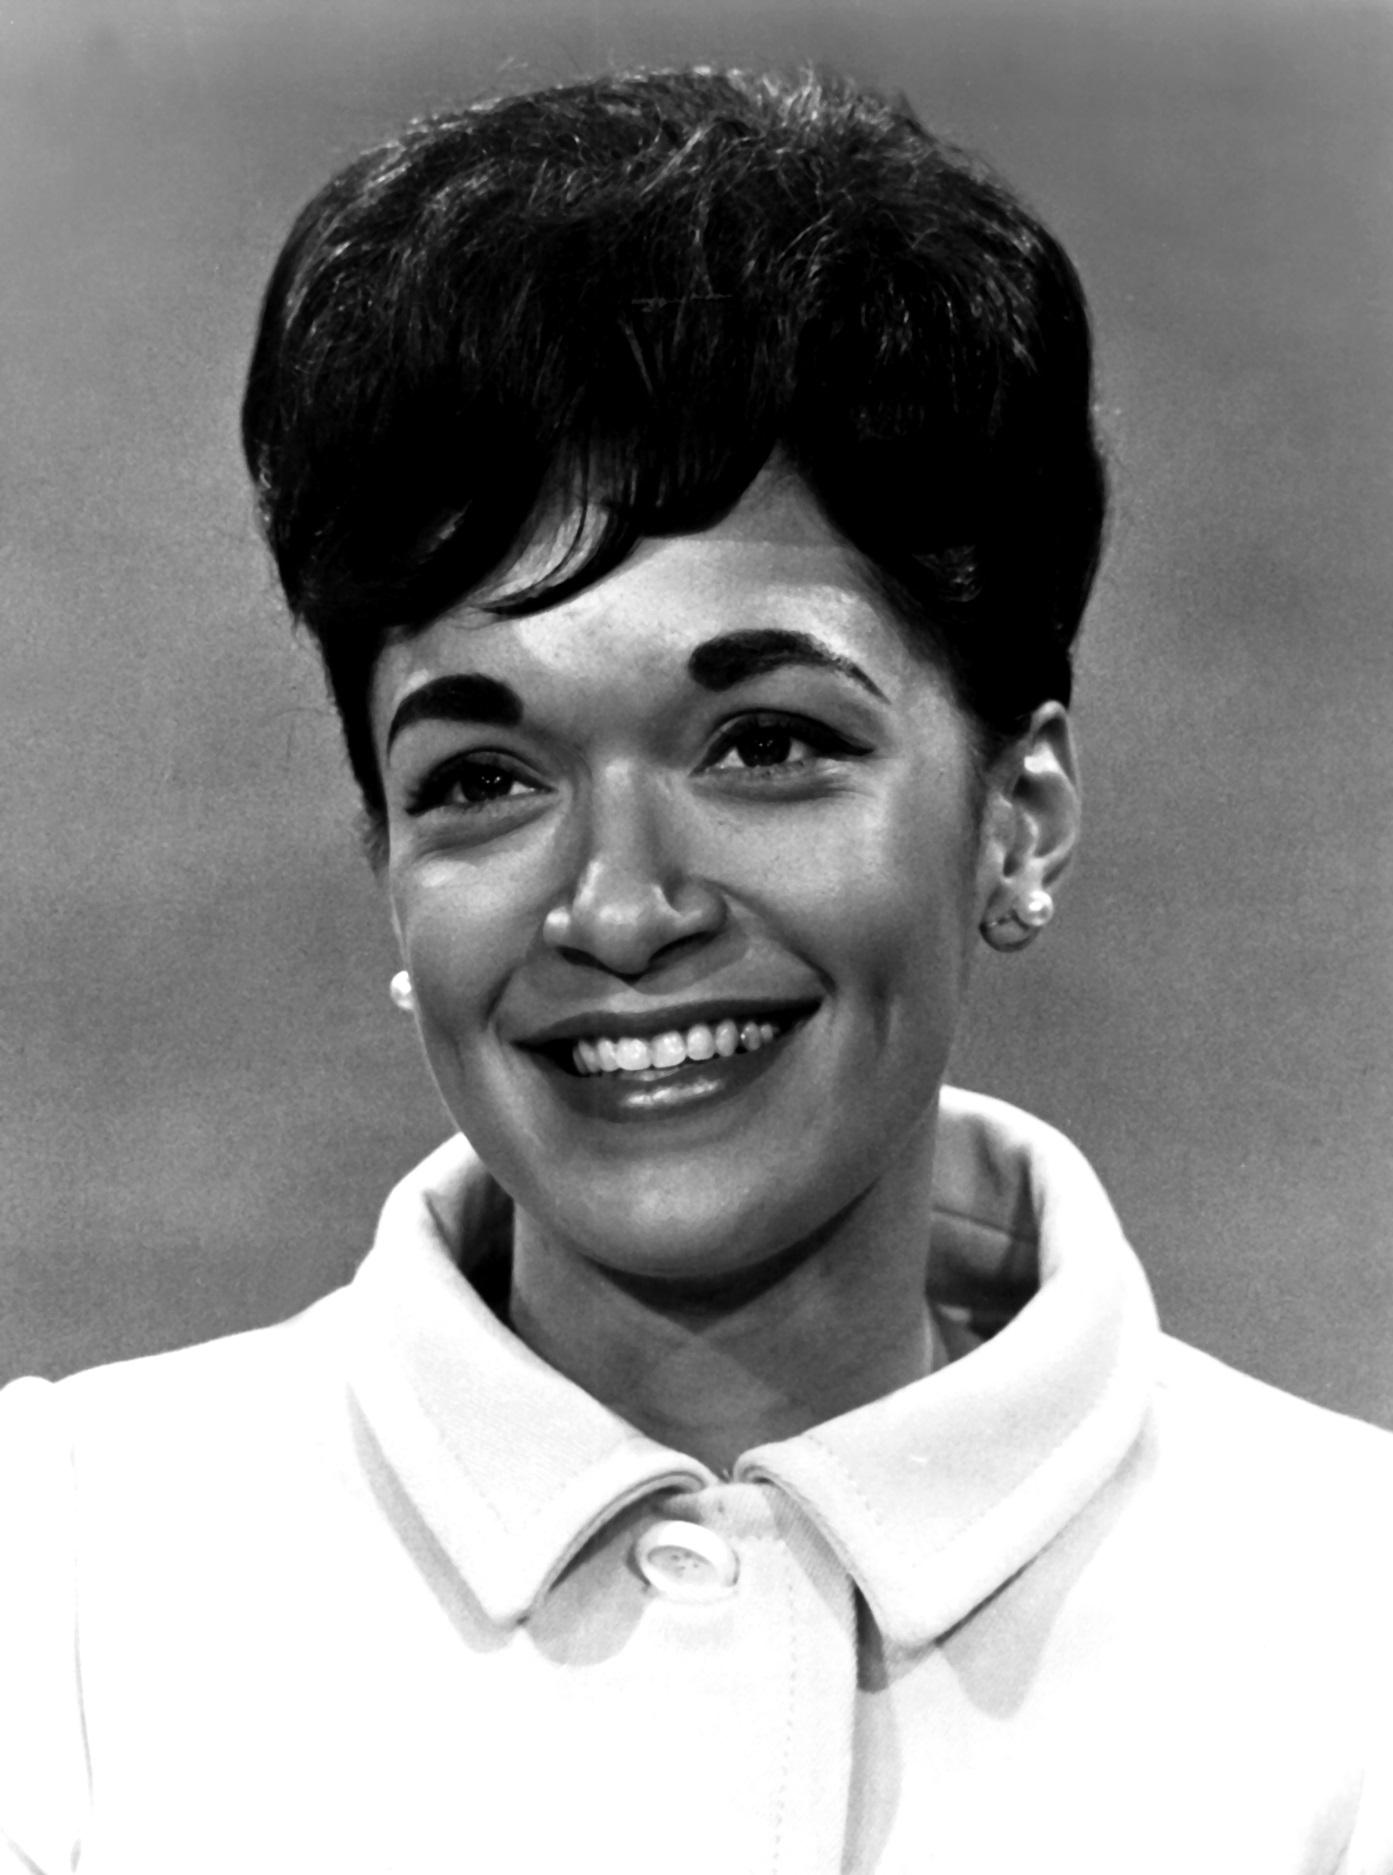 Obituary: Dianne White Clatto, nation's first black TV